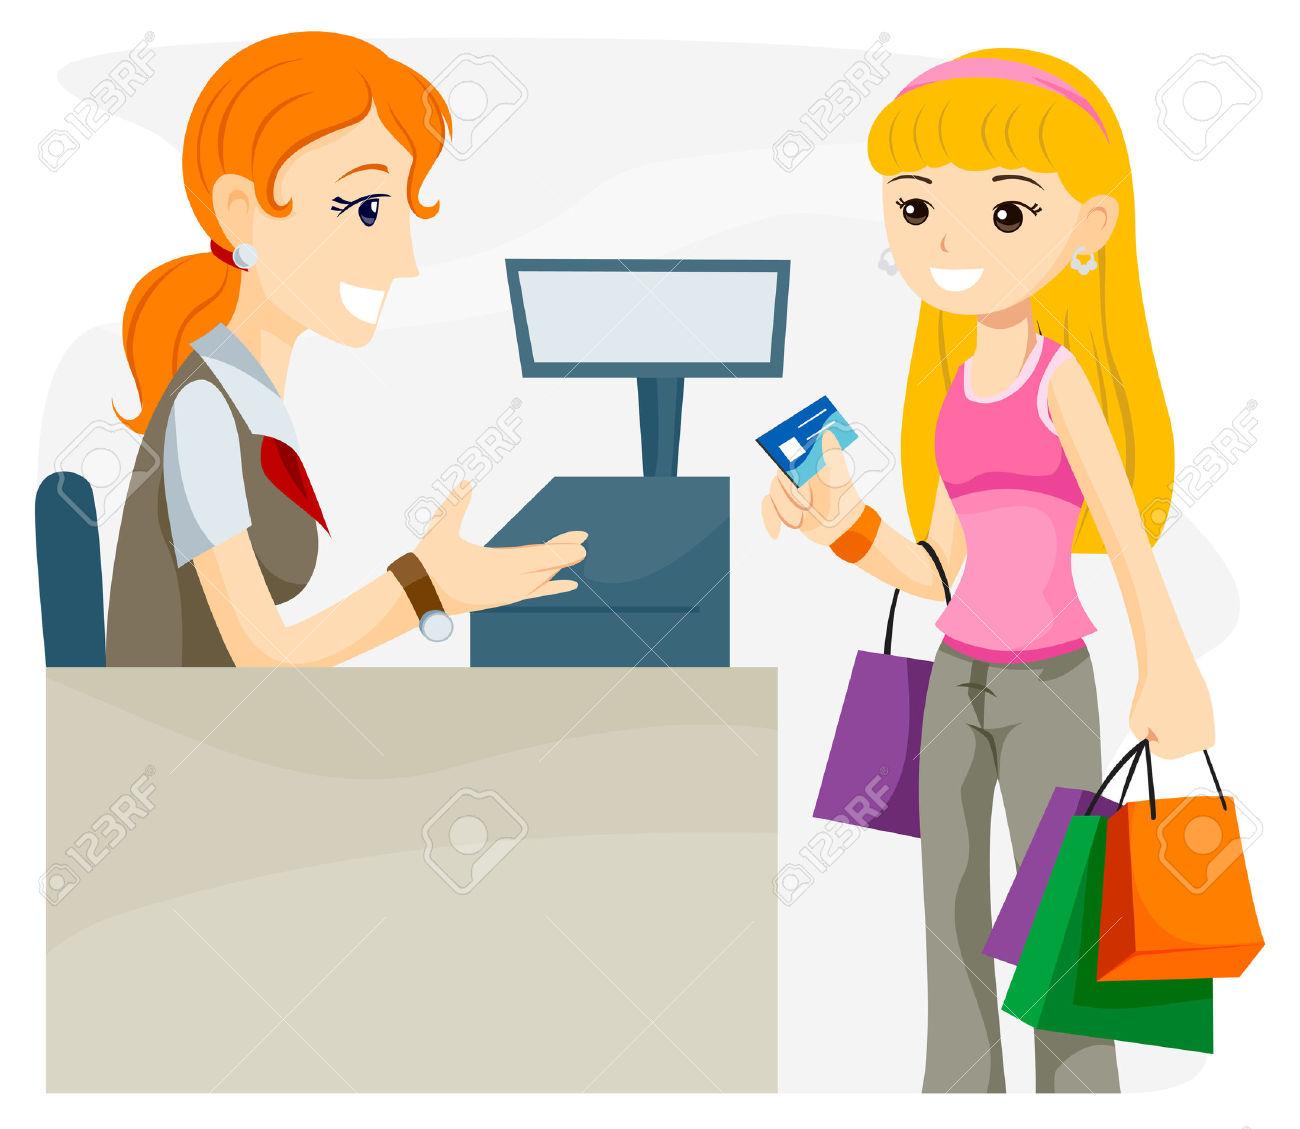 cashier clipart card payment #39947090